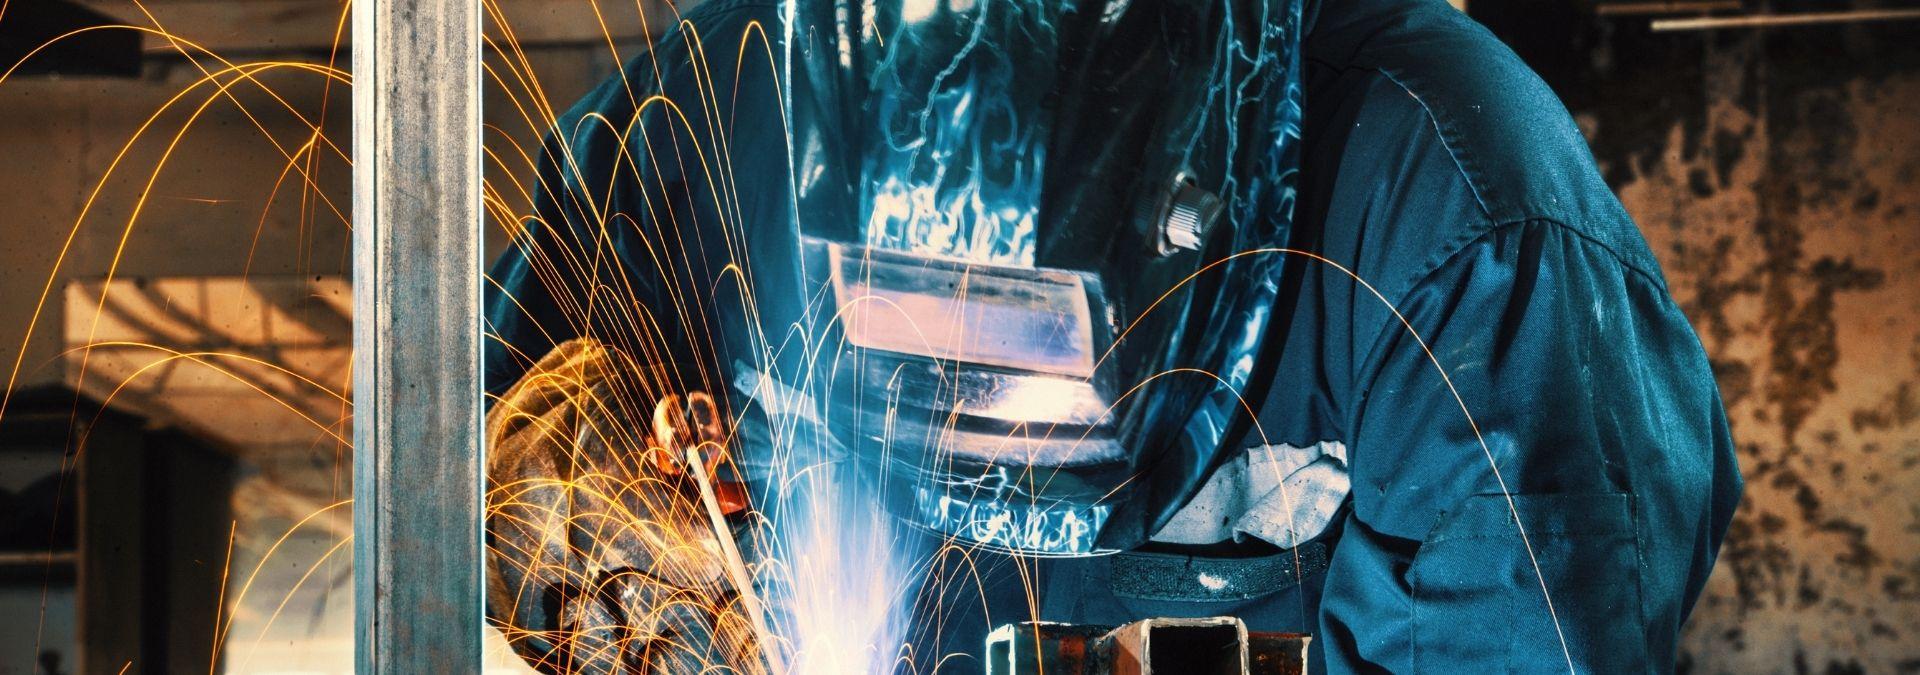 Welding Fabrication Technician